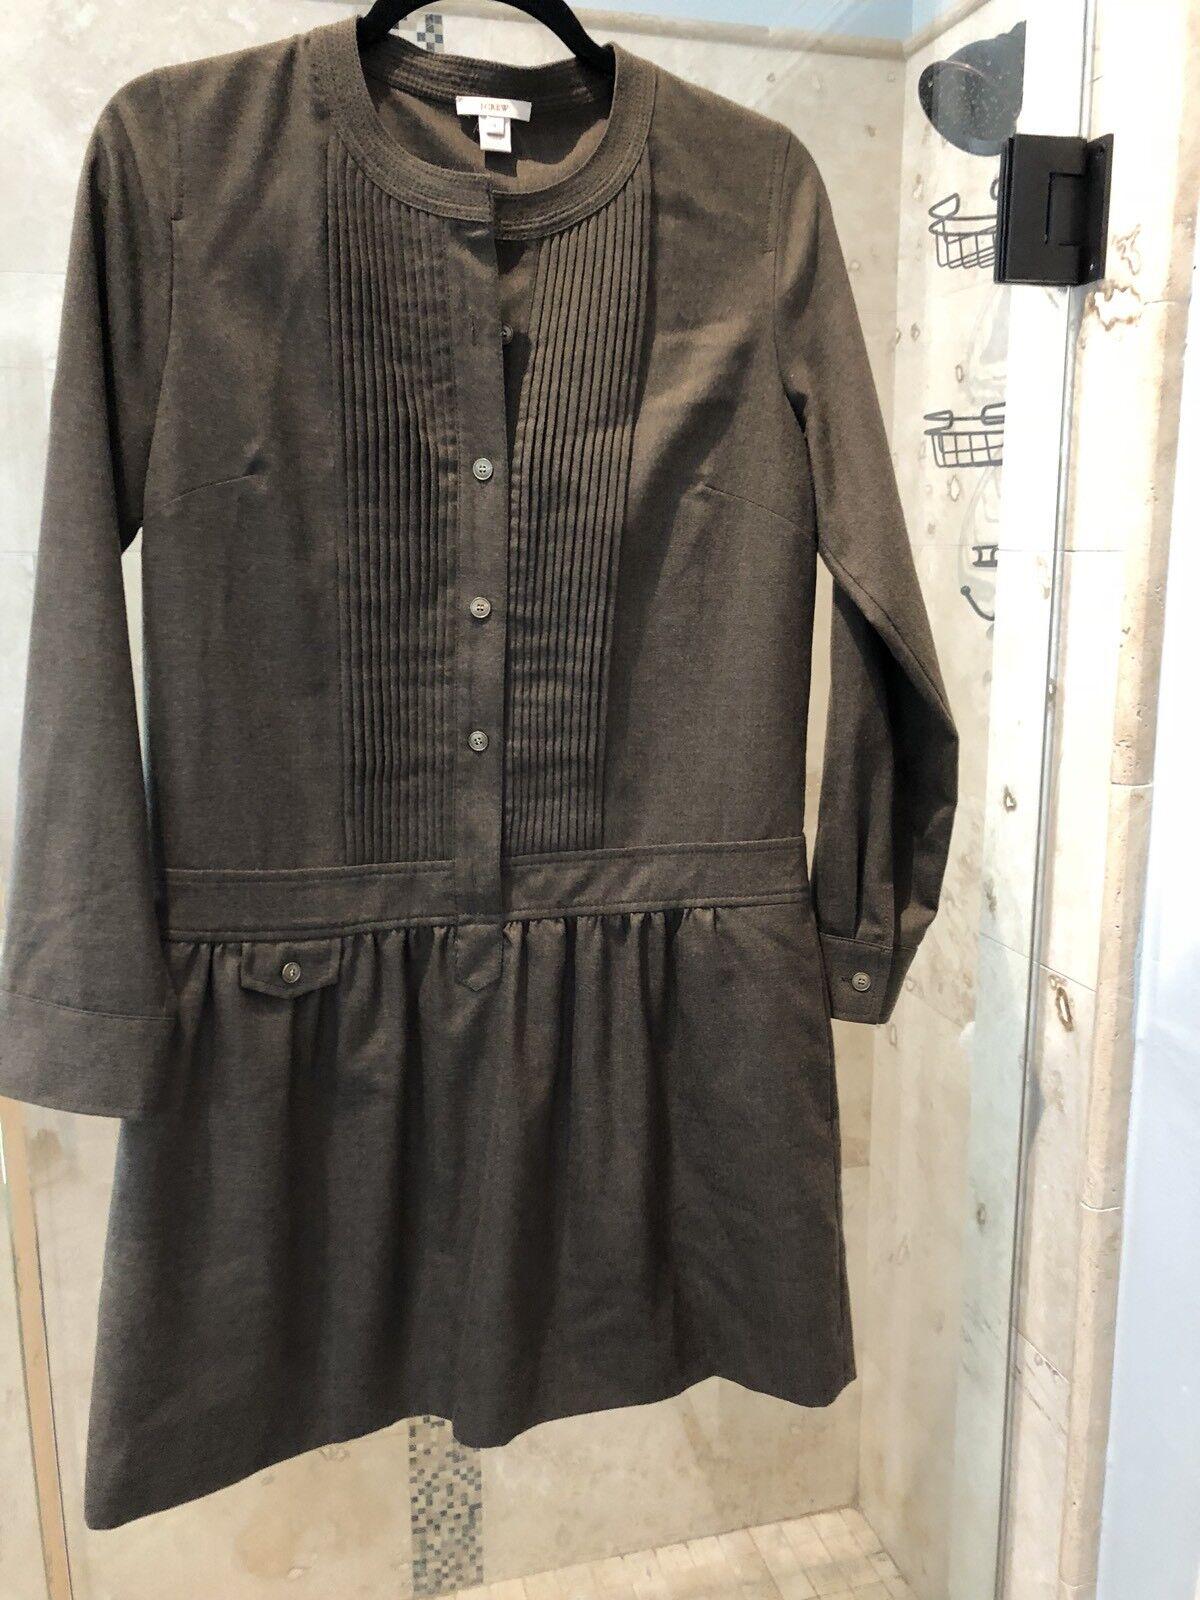 J Crew Wool Drop Waist Dress Long Sleeve Pleated Army Grün Pockets - S 4